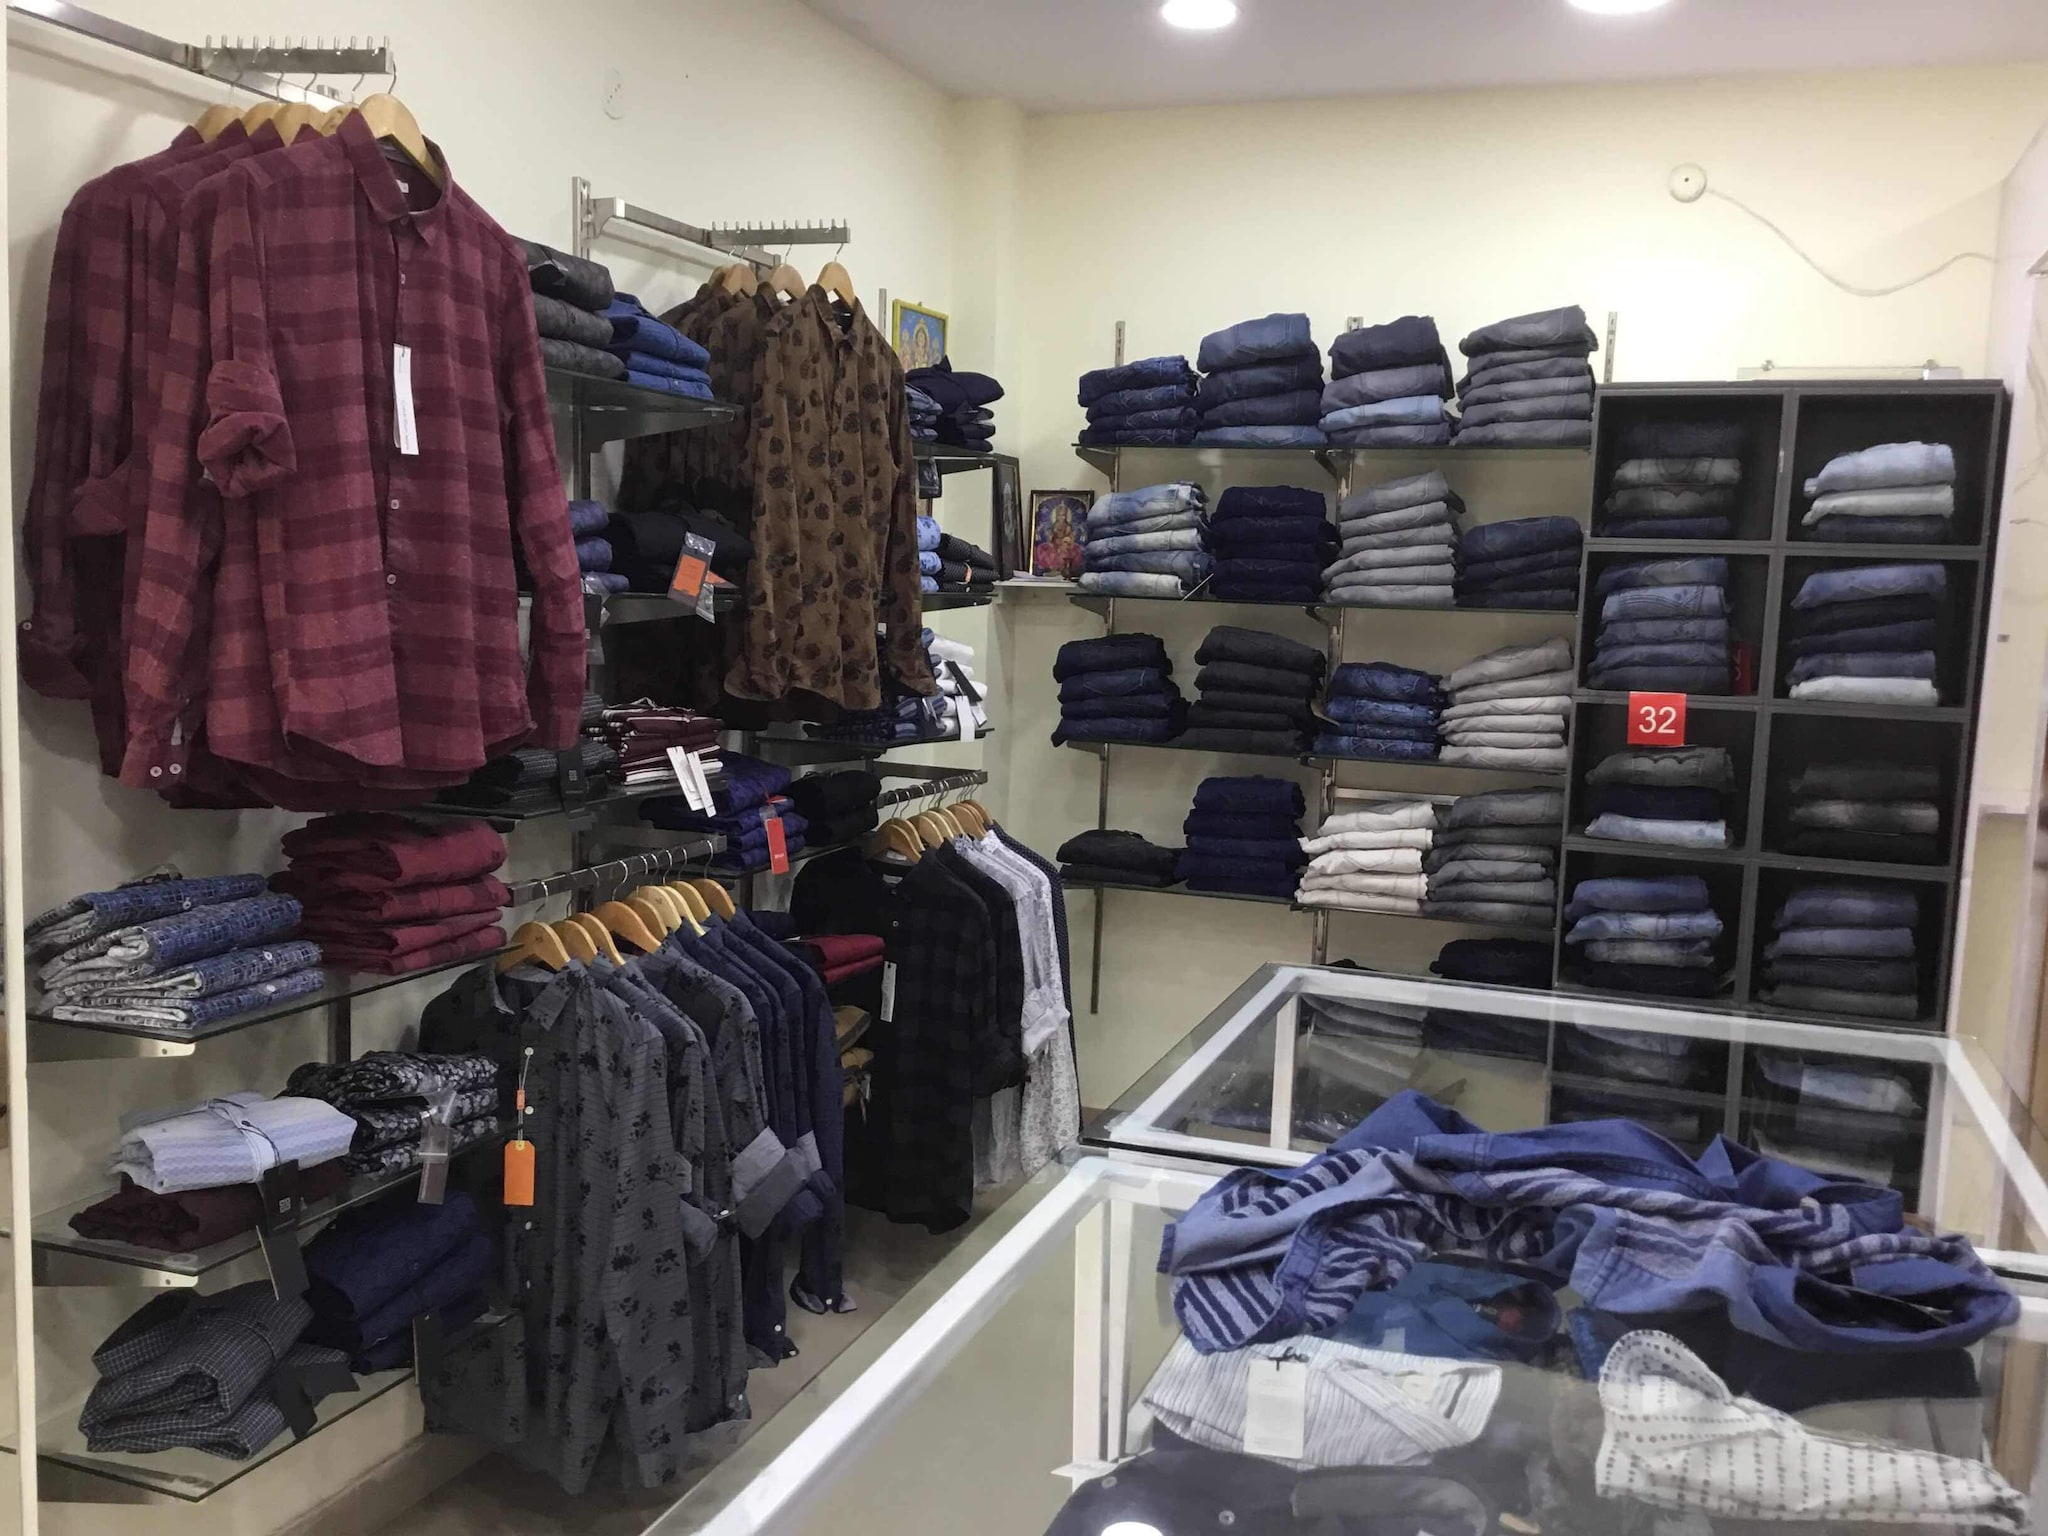 c0771261b5 Top 100 Gents Readymade Garment Retailers in Bhimavaram - Best ...